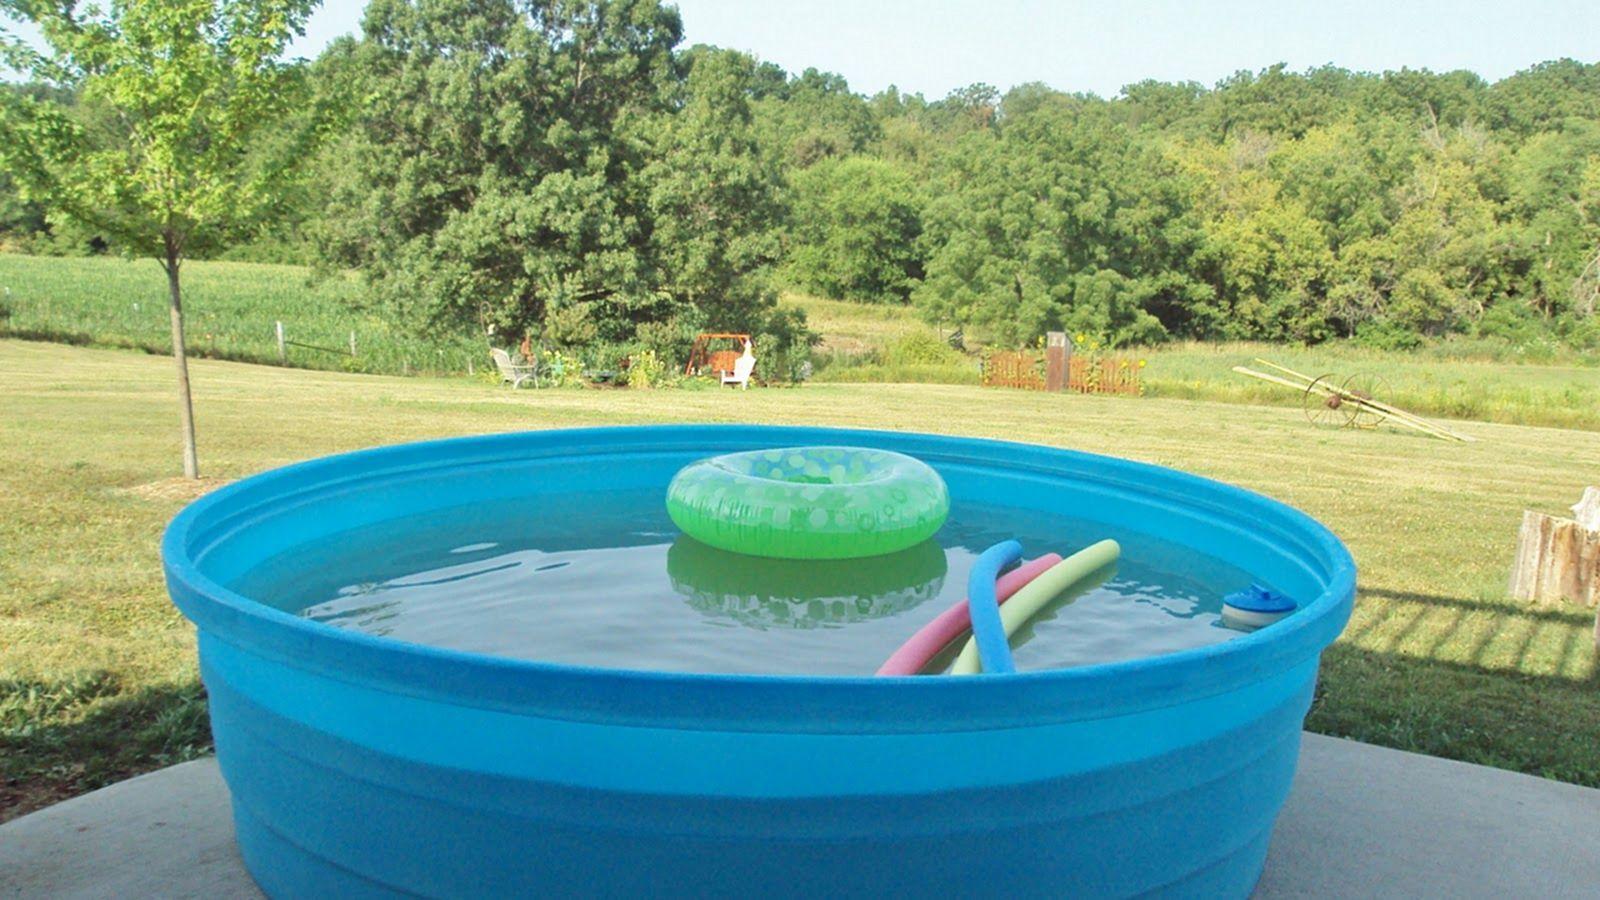 50 Best Mini Stock Tank Pool Plastic Material For Safe Kids Ideas